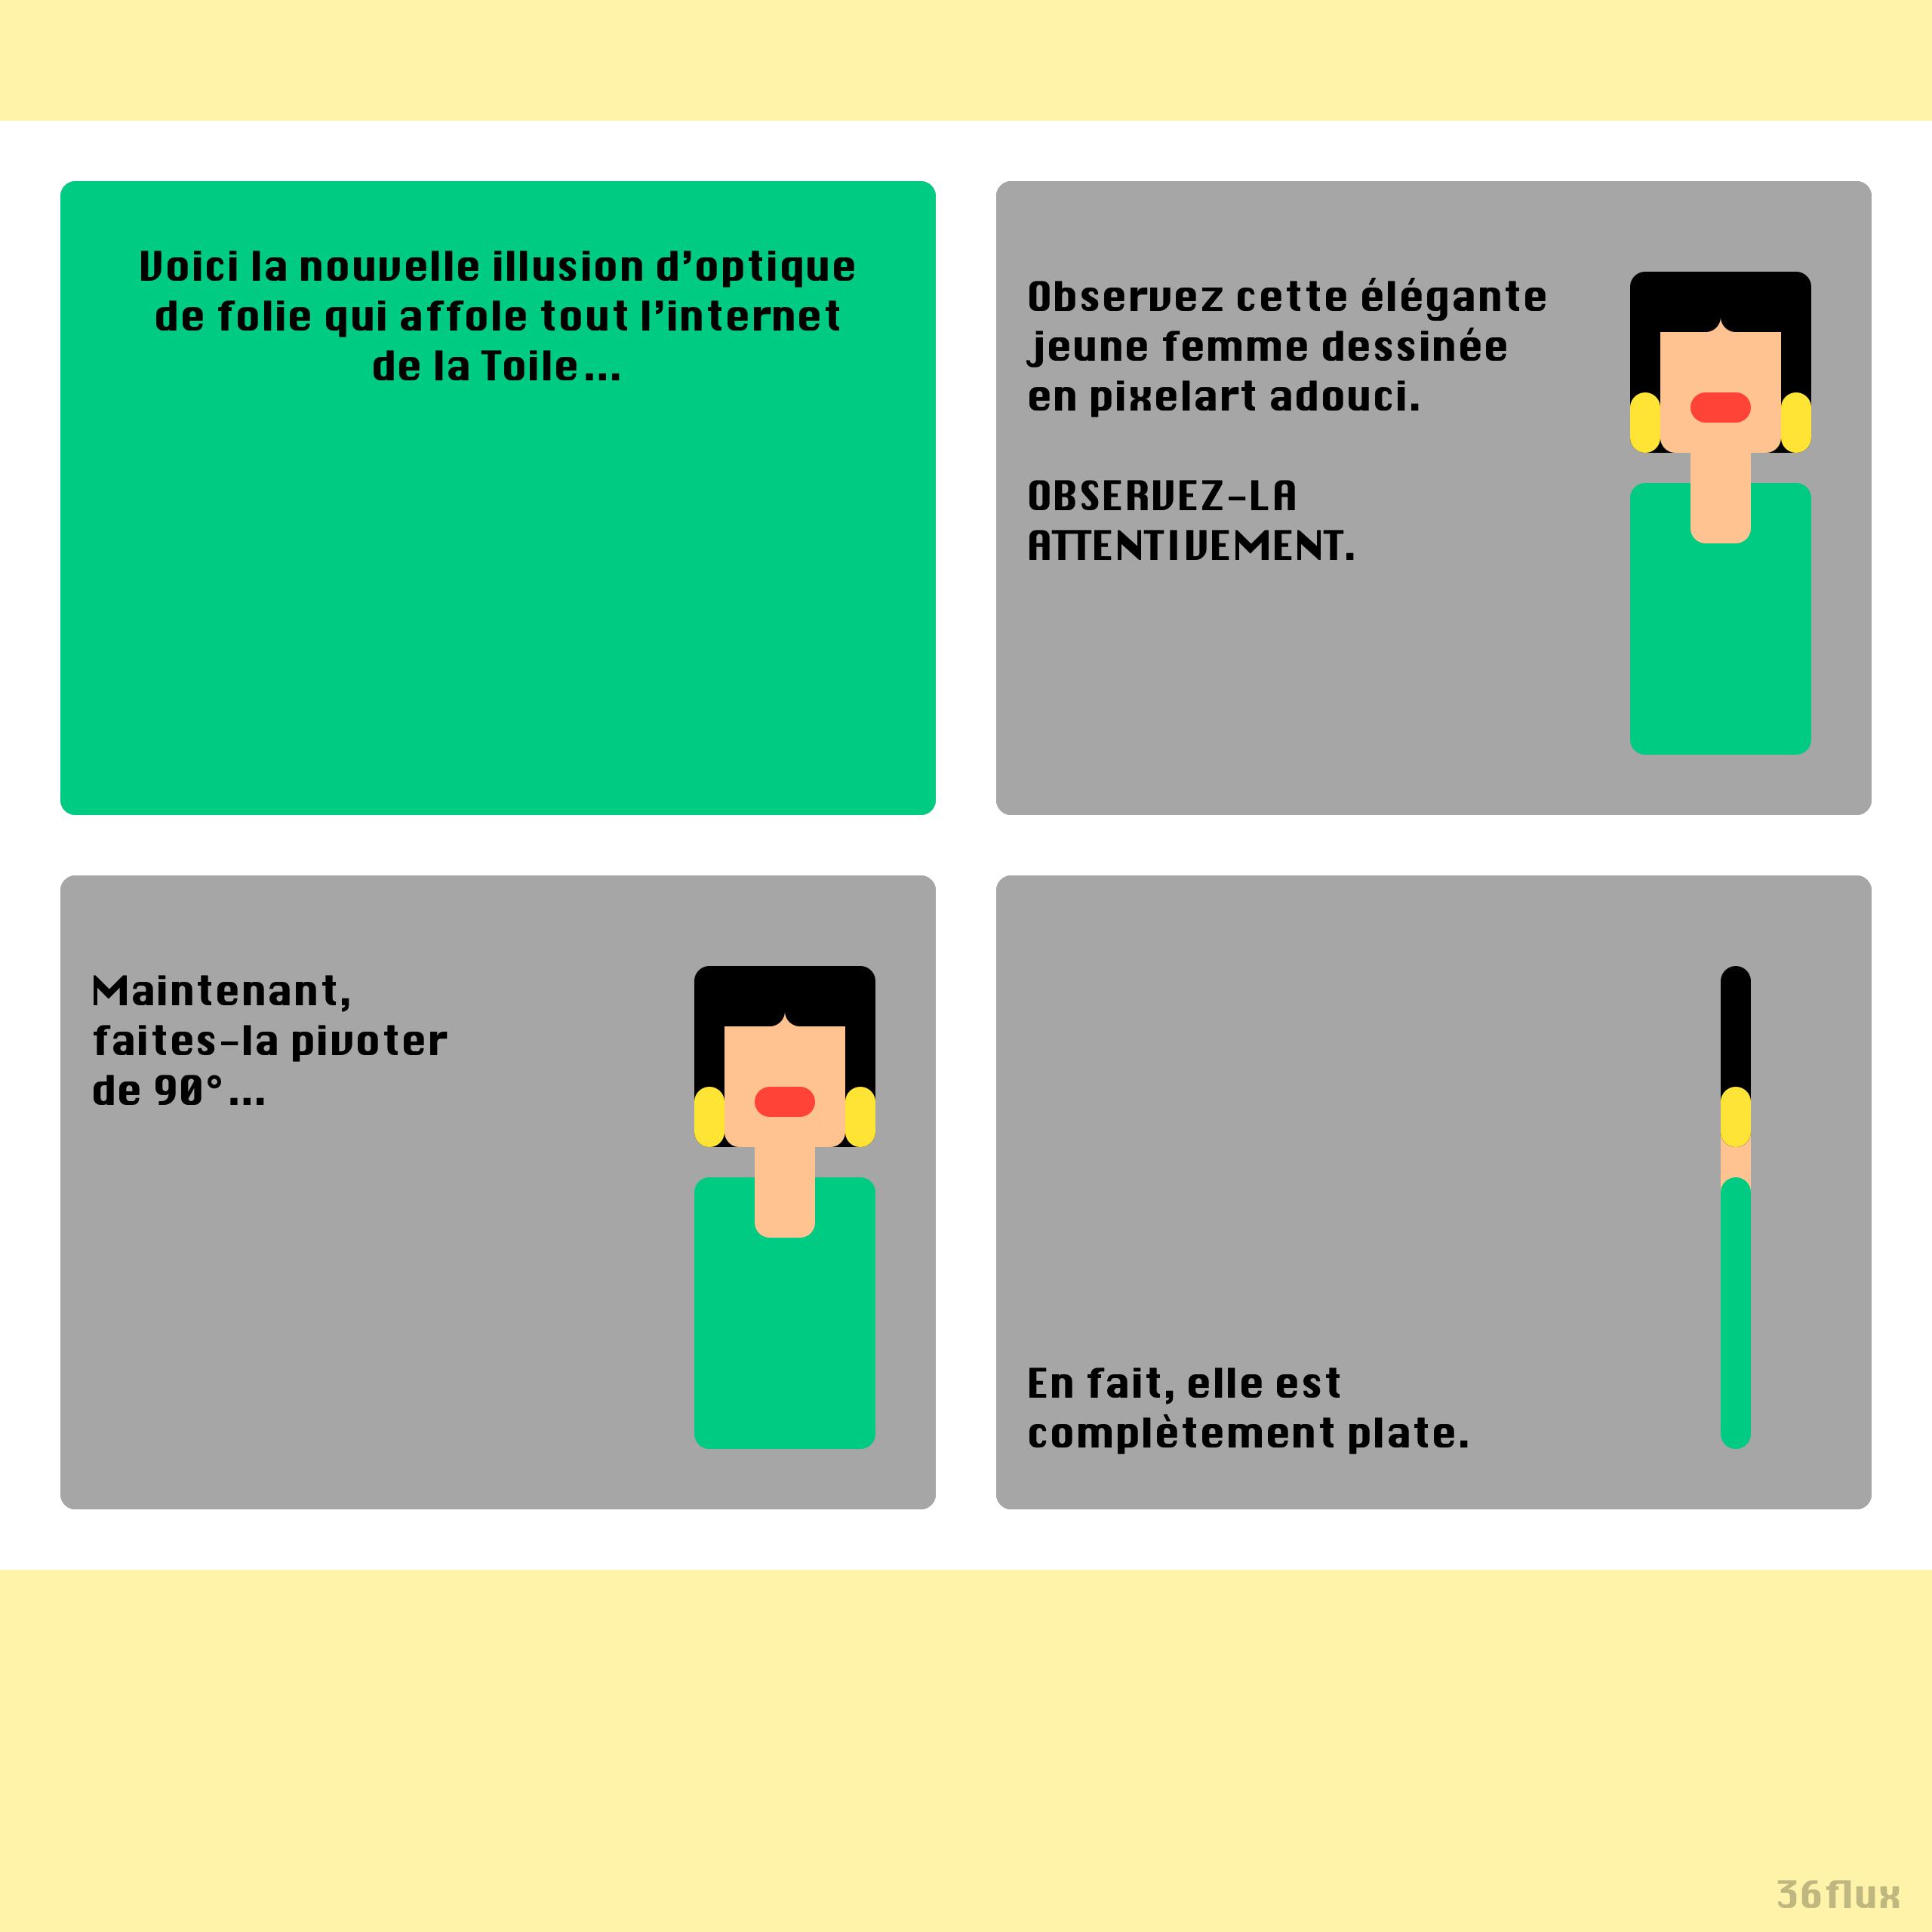 webcomics illusion d'optique